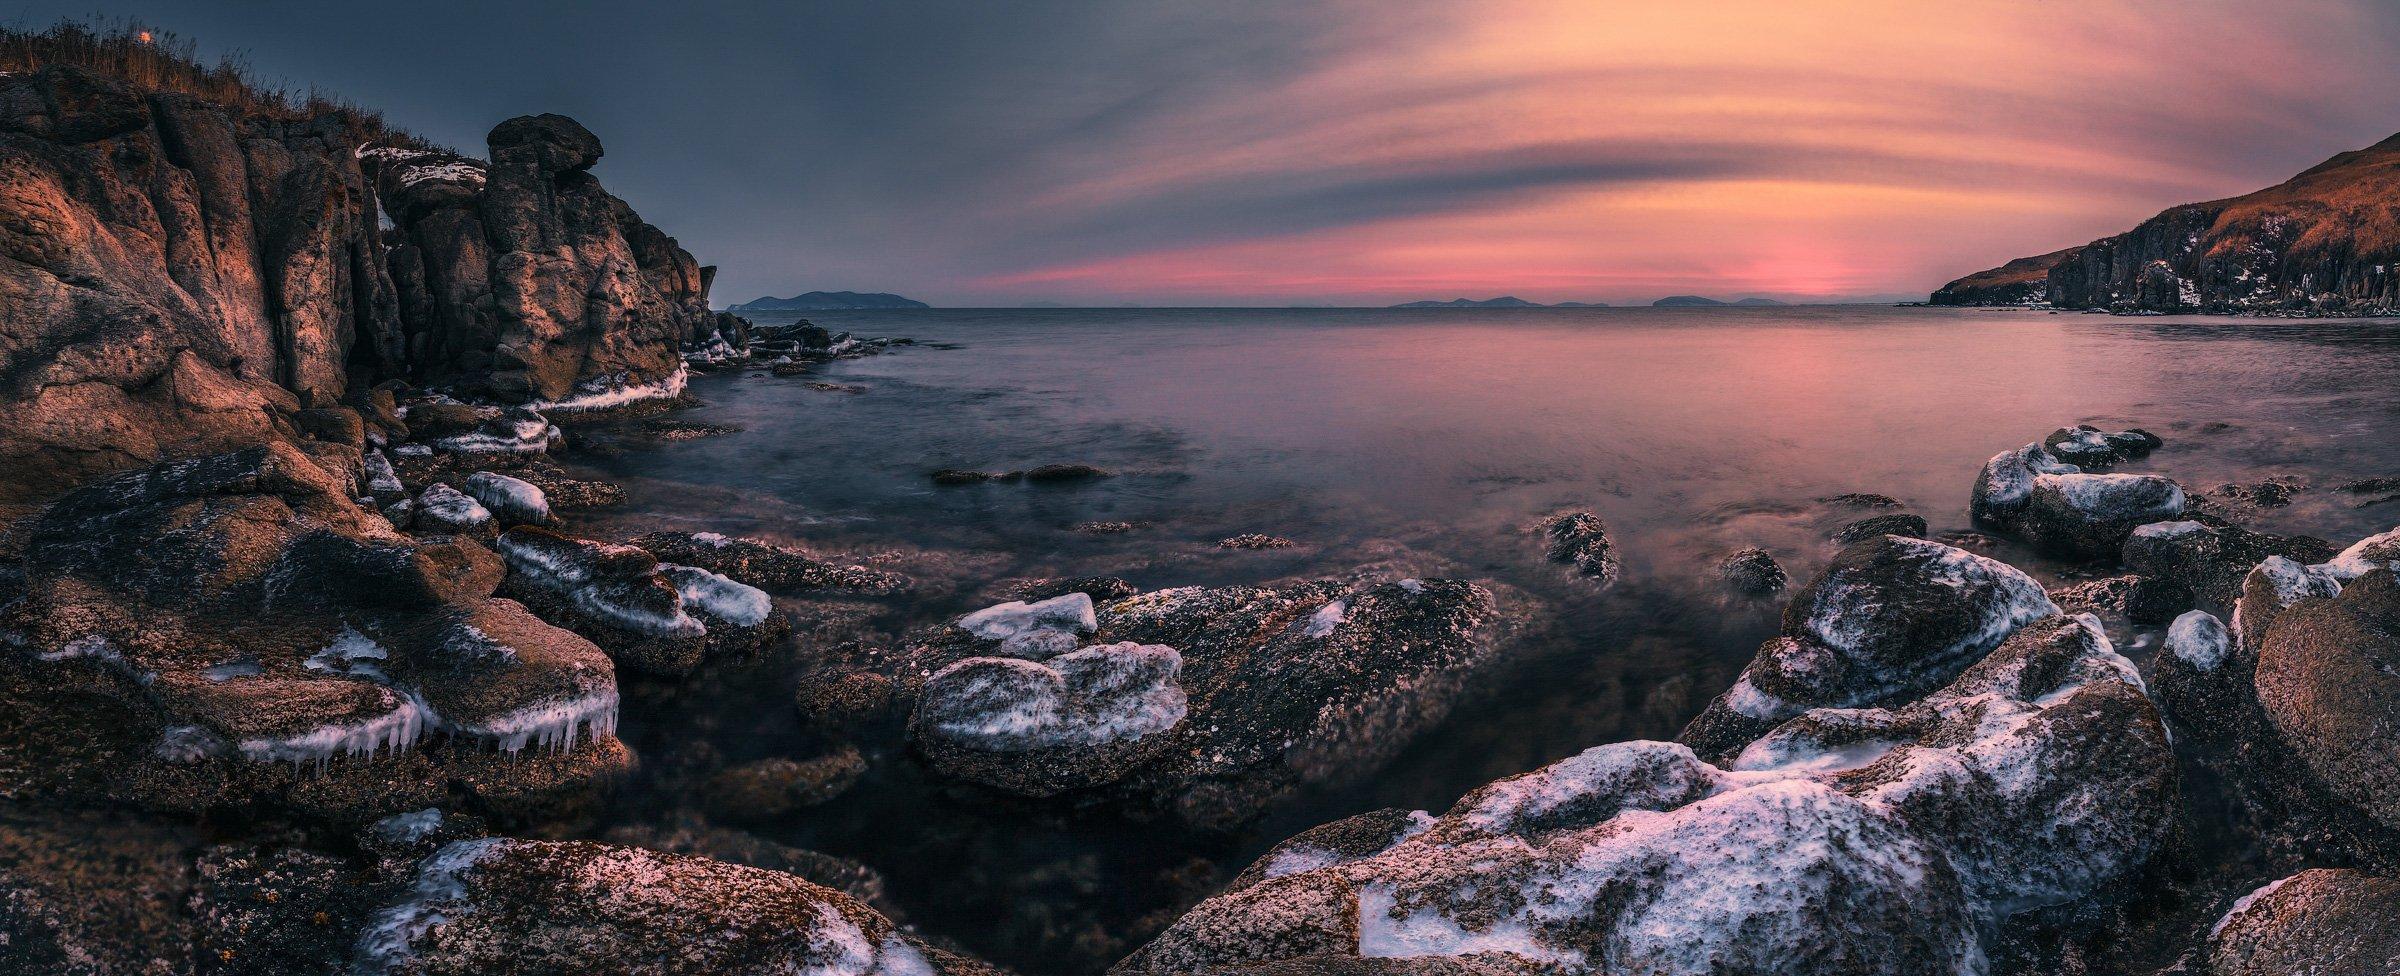 панорама. море, скалы, зима, лёд, Андрей Кровлин